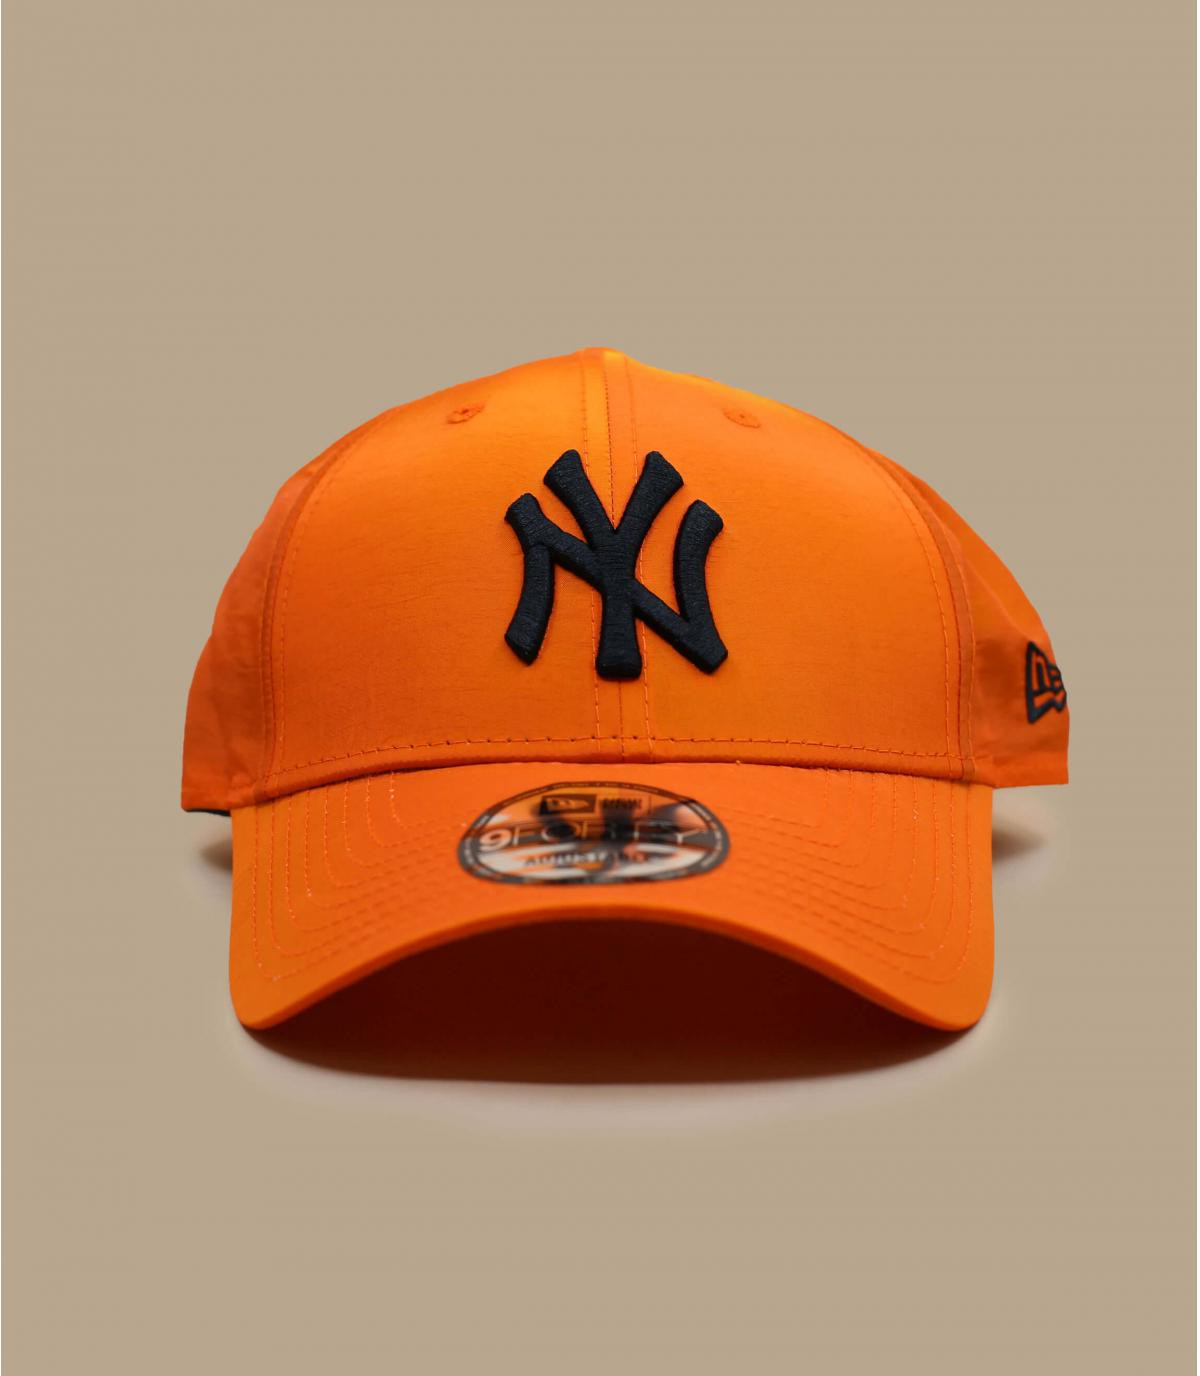 Cappellino NY arancio iridescente